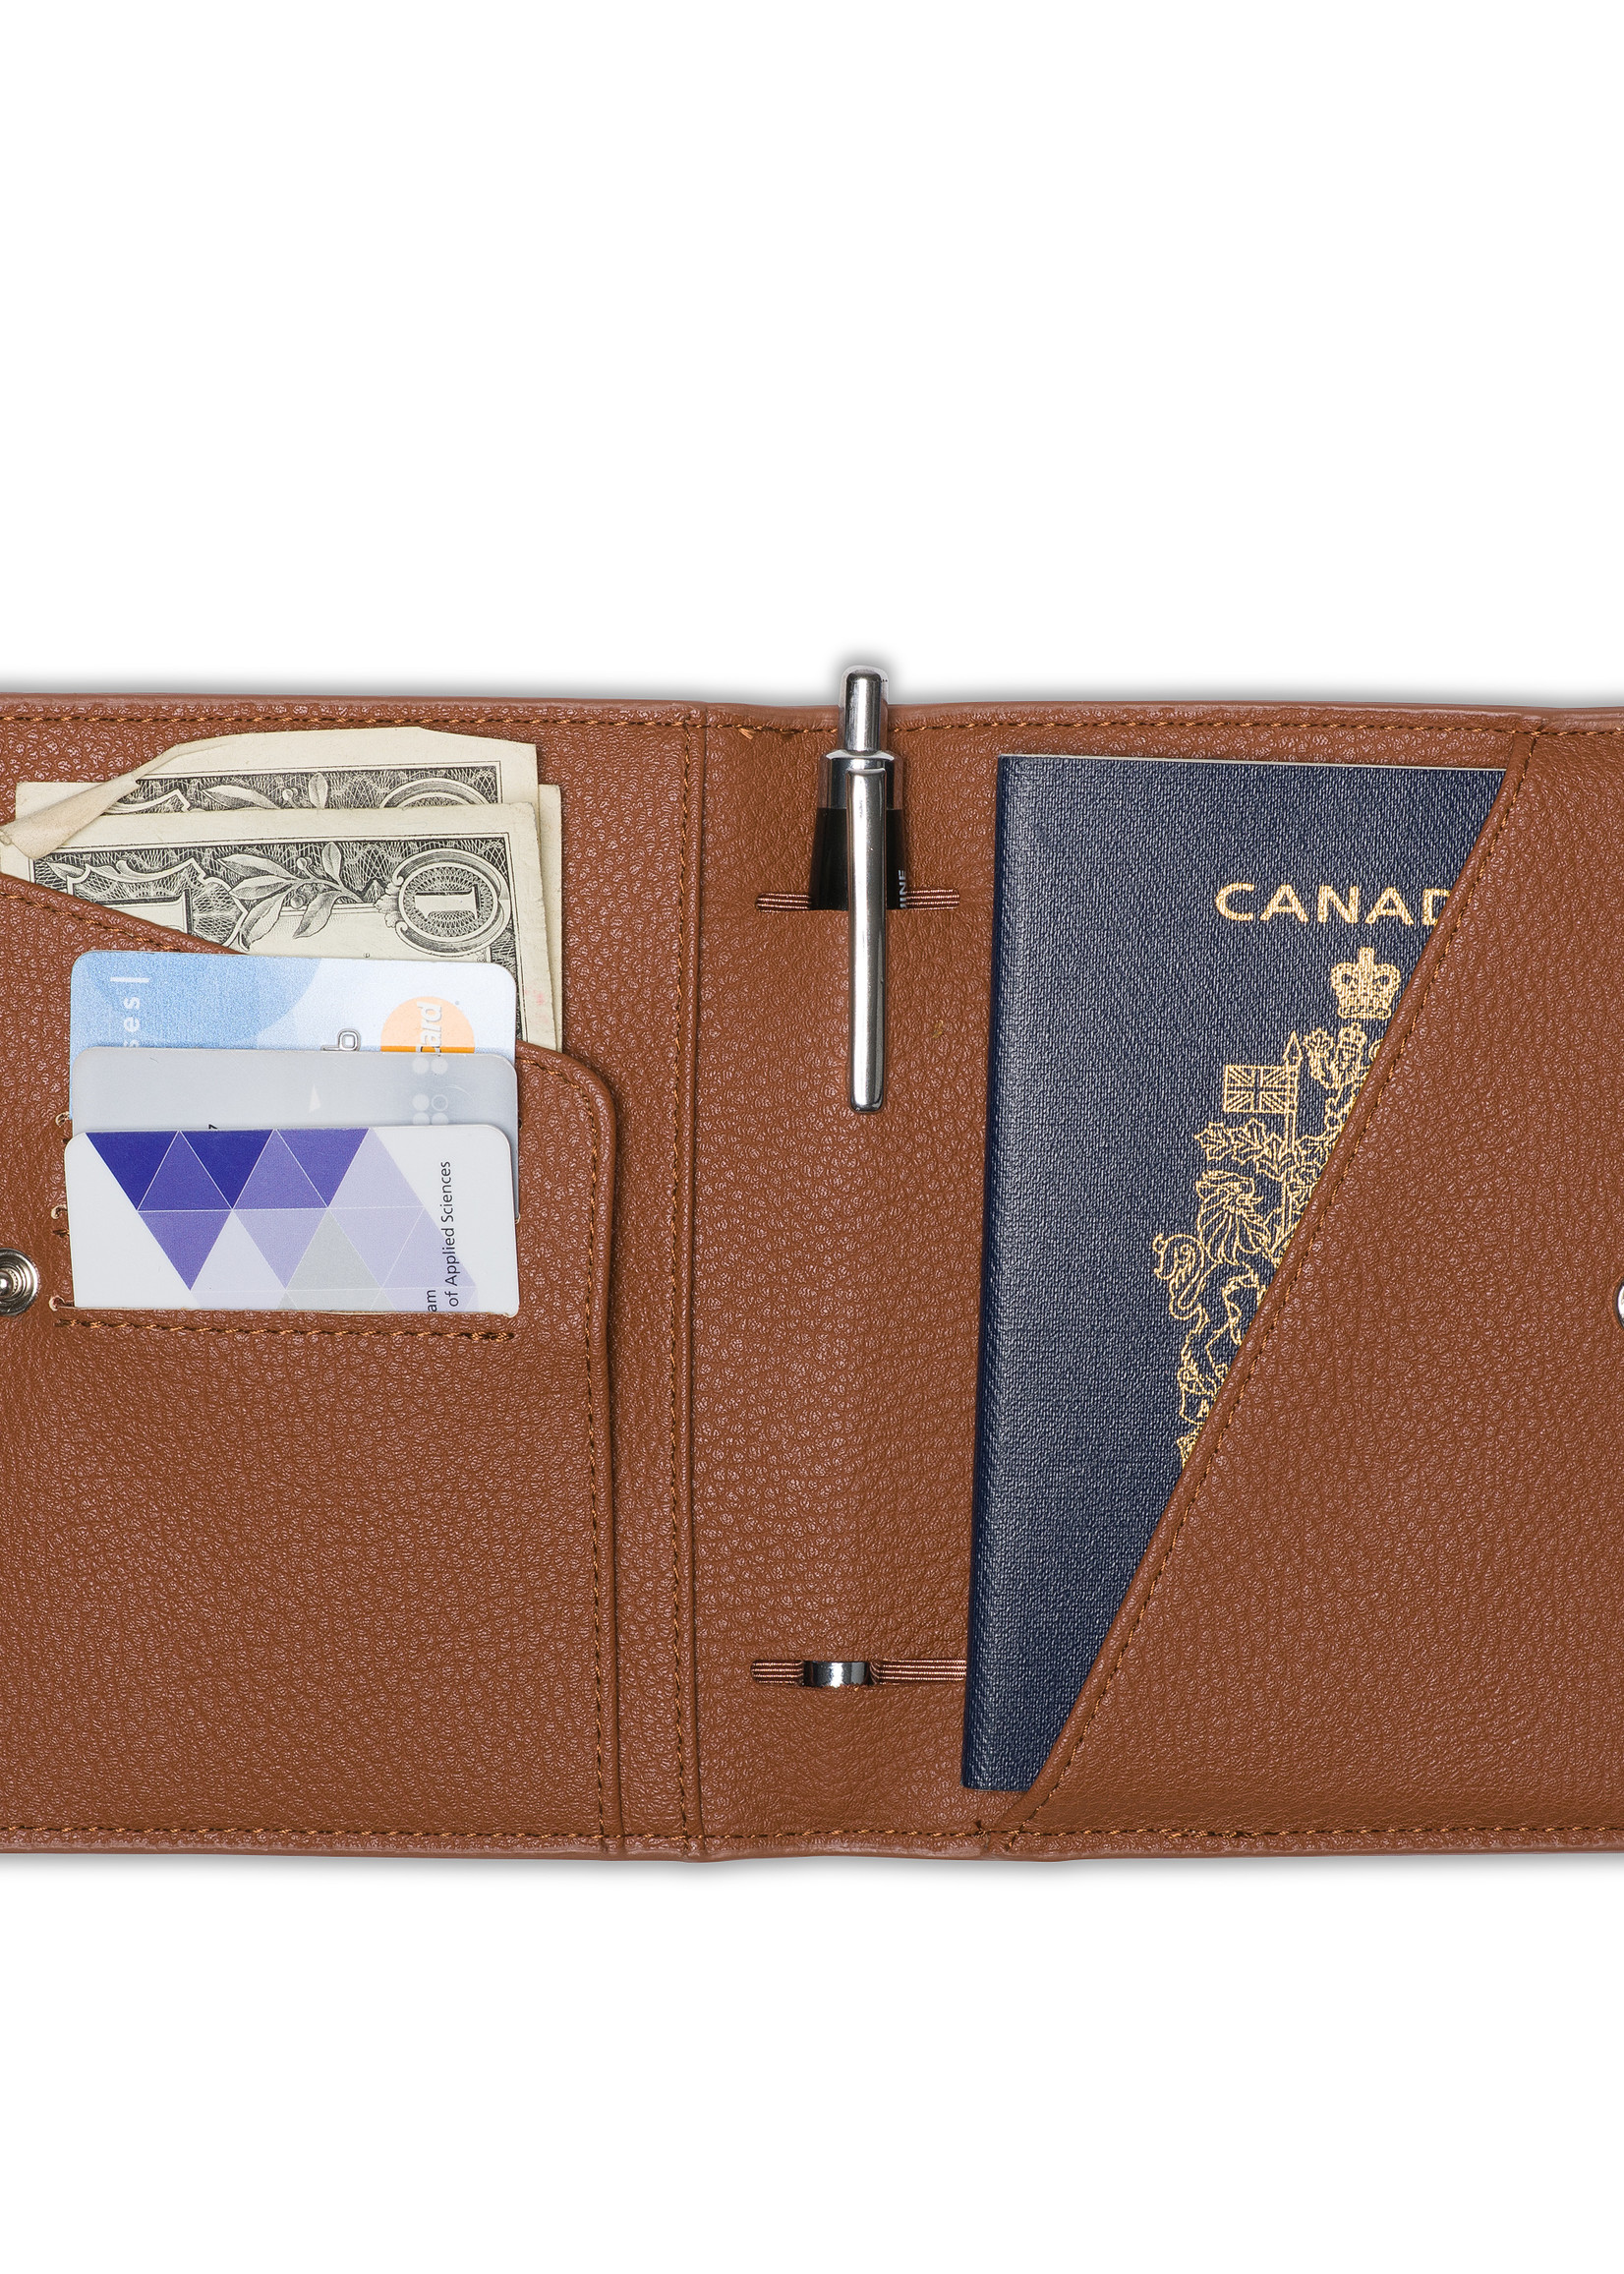 Lambert The CLARA - Vegan Leather Unisex Travel Accessory